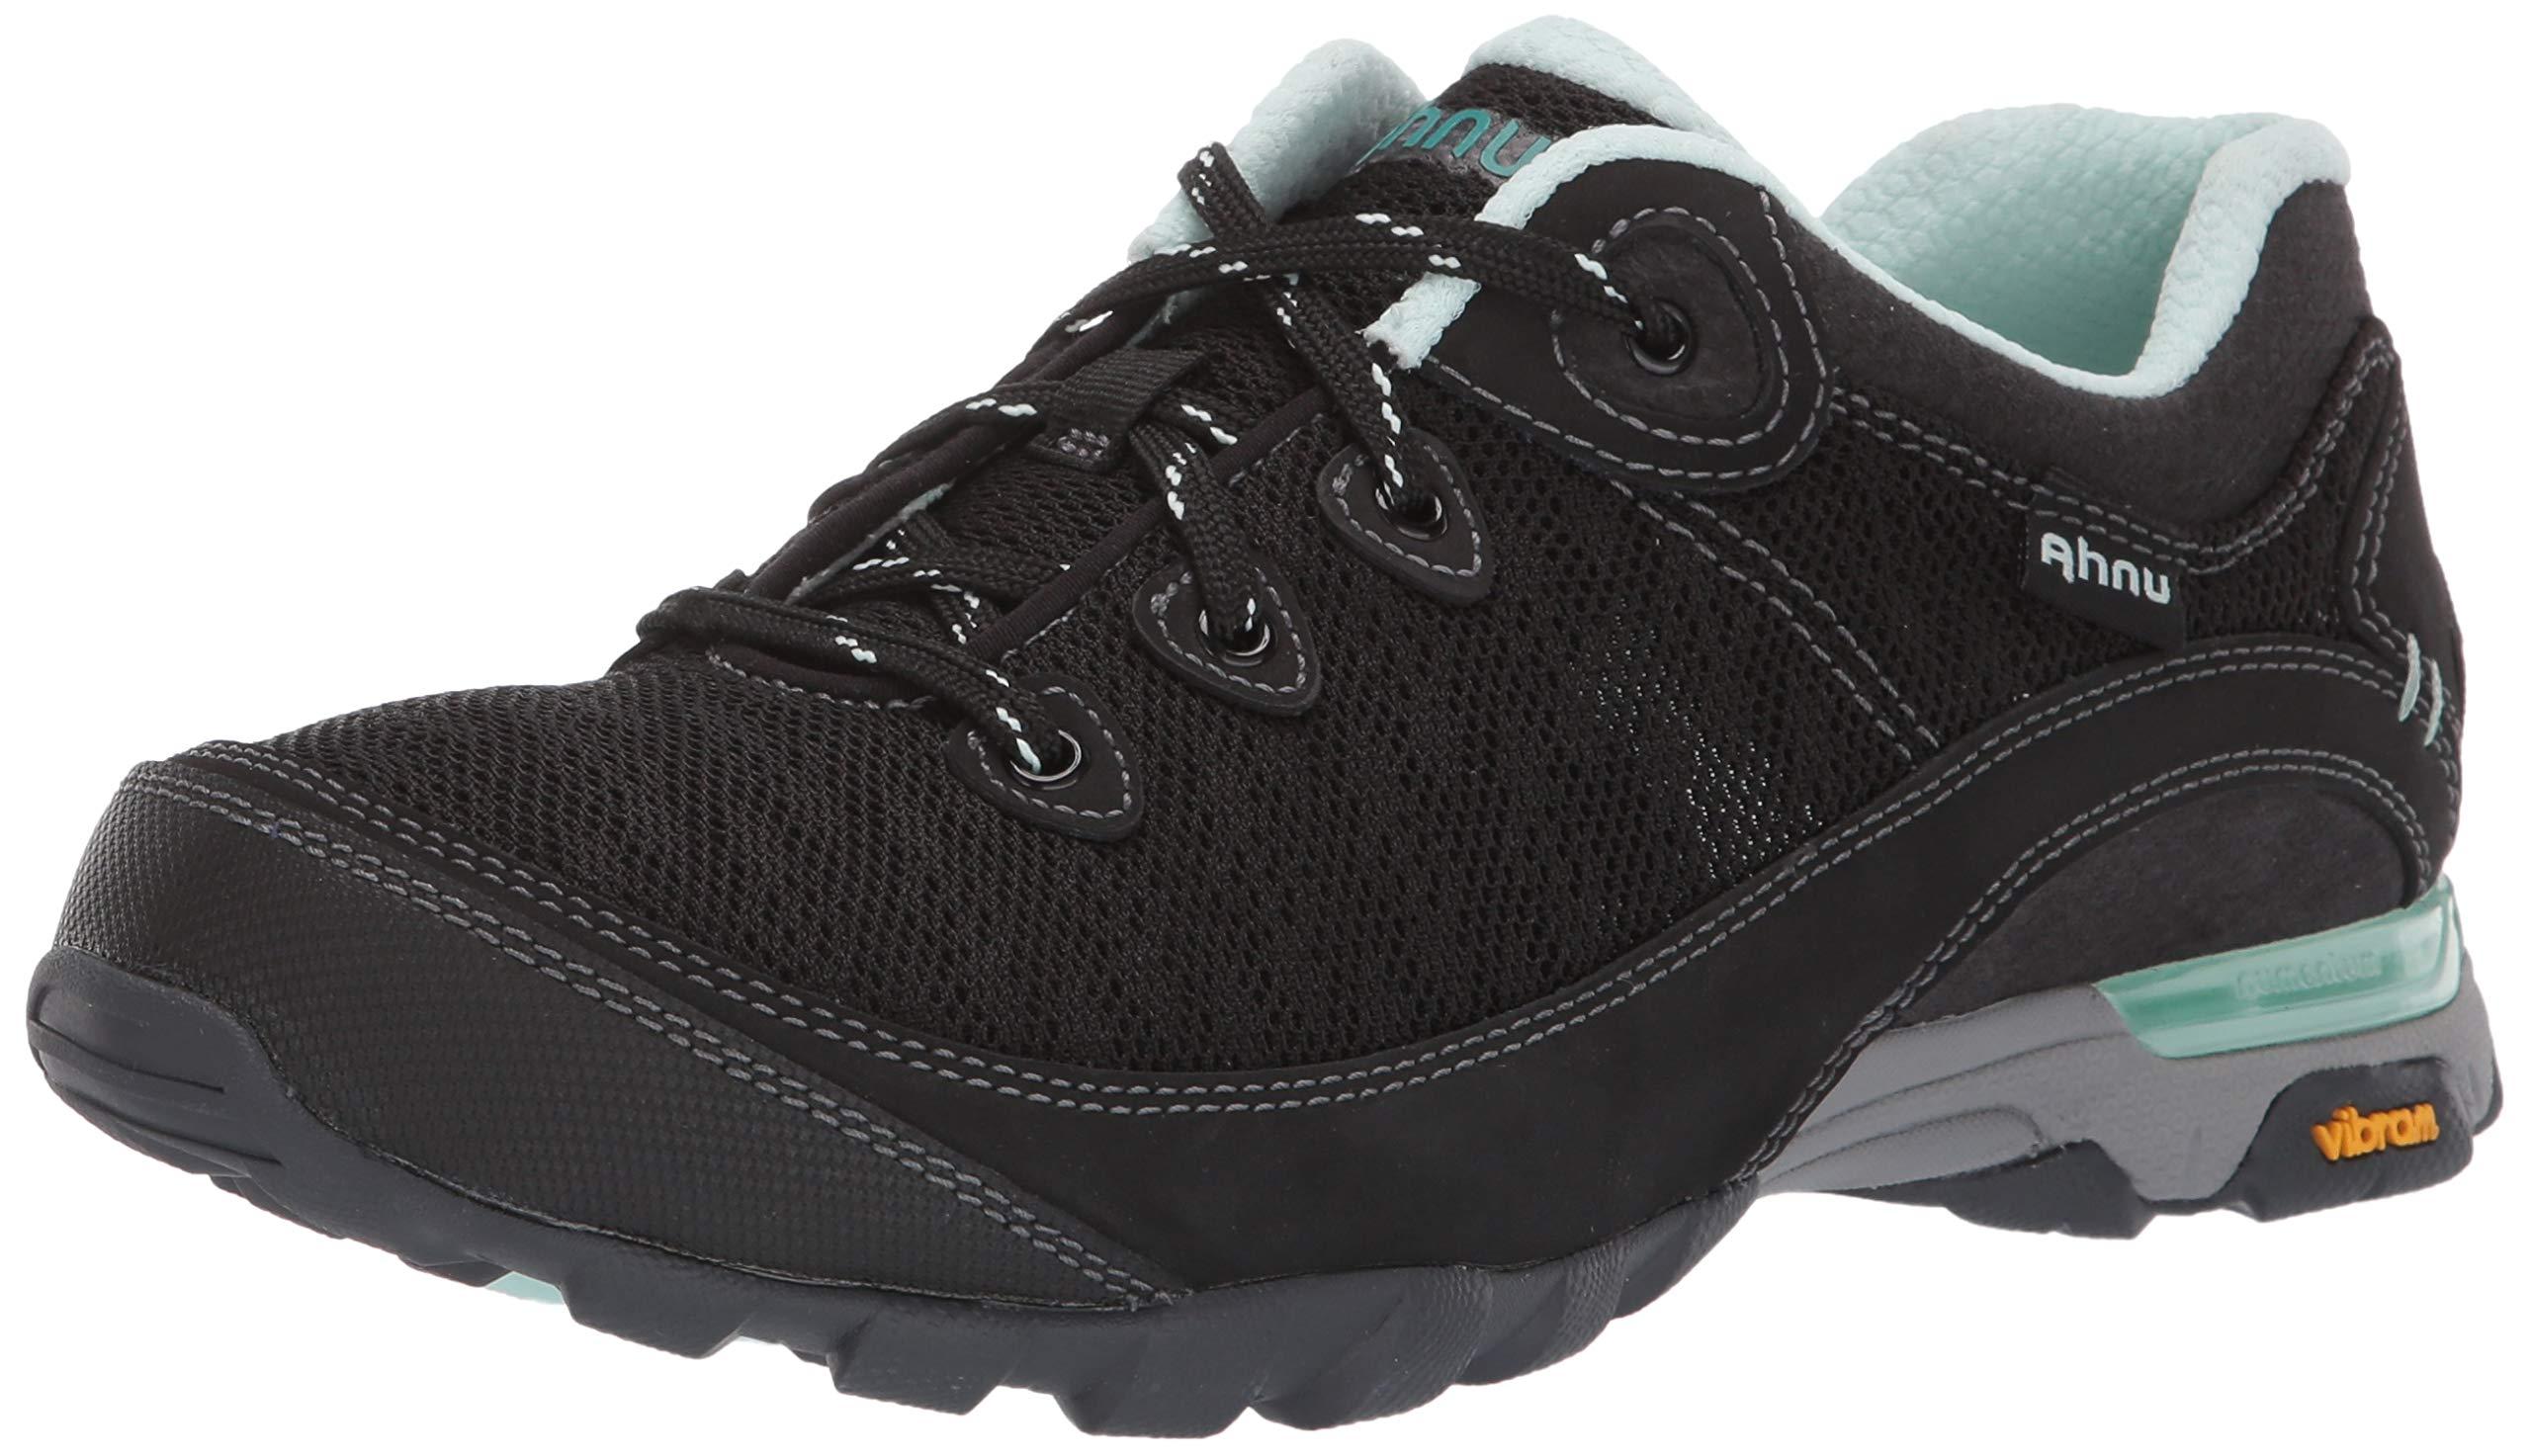 Ahnu Women's W Sugarpine II AIR MESH Hiking Shoe, Black, 8 Medium US by Ahnu